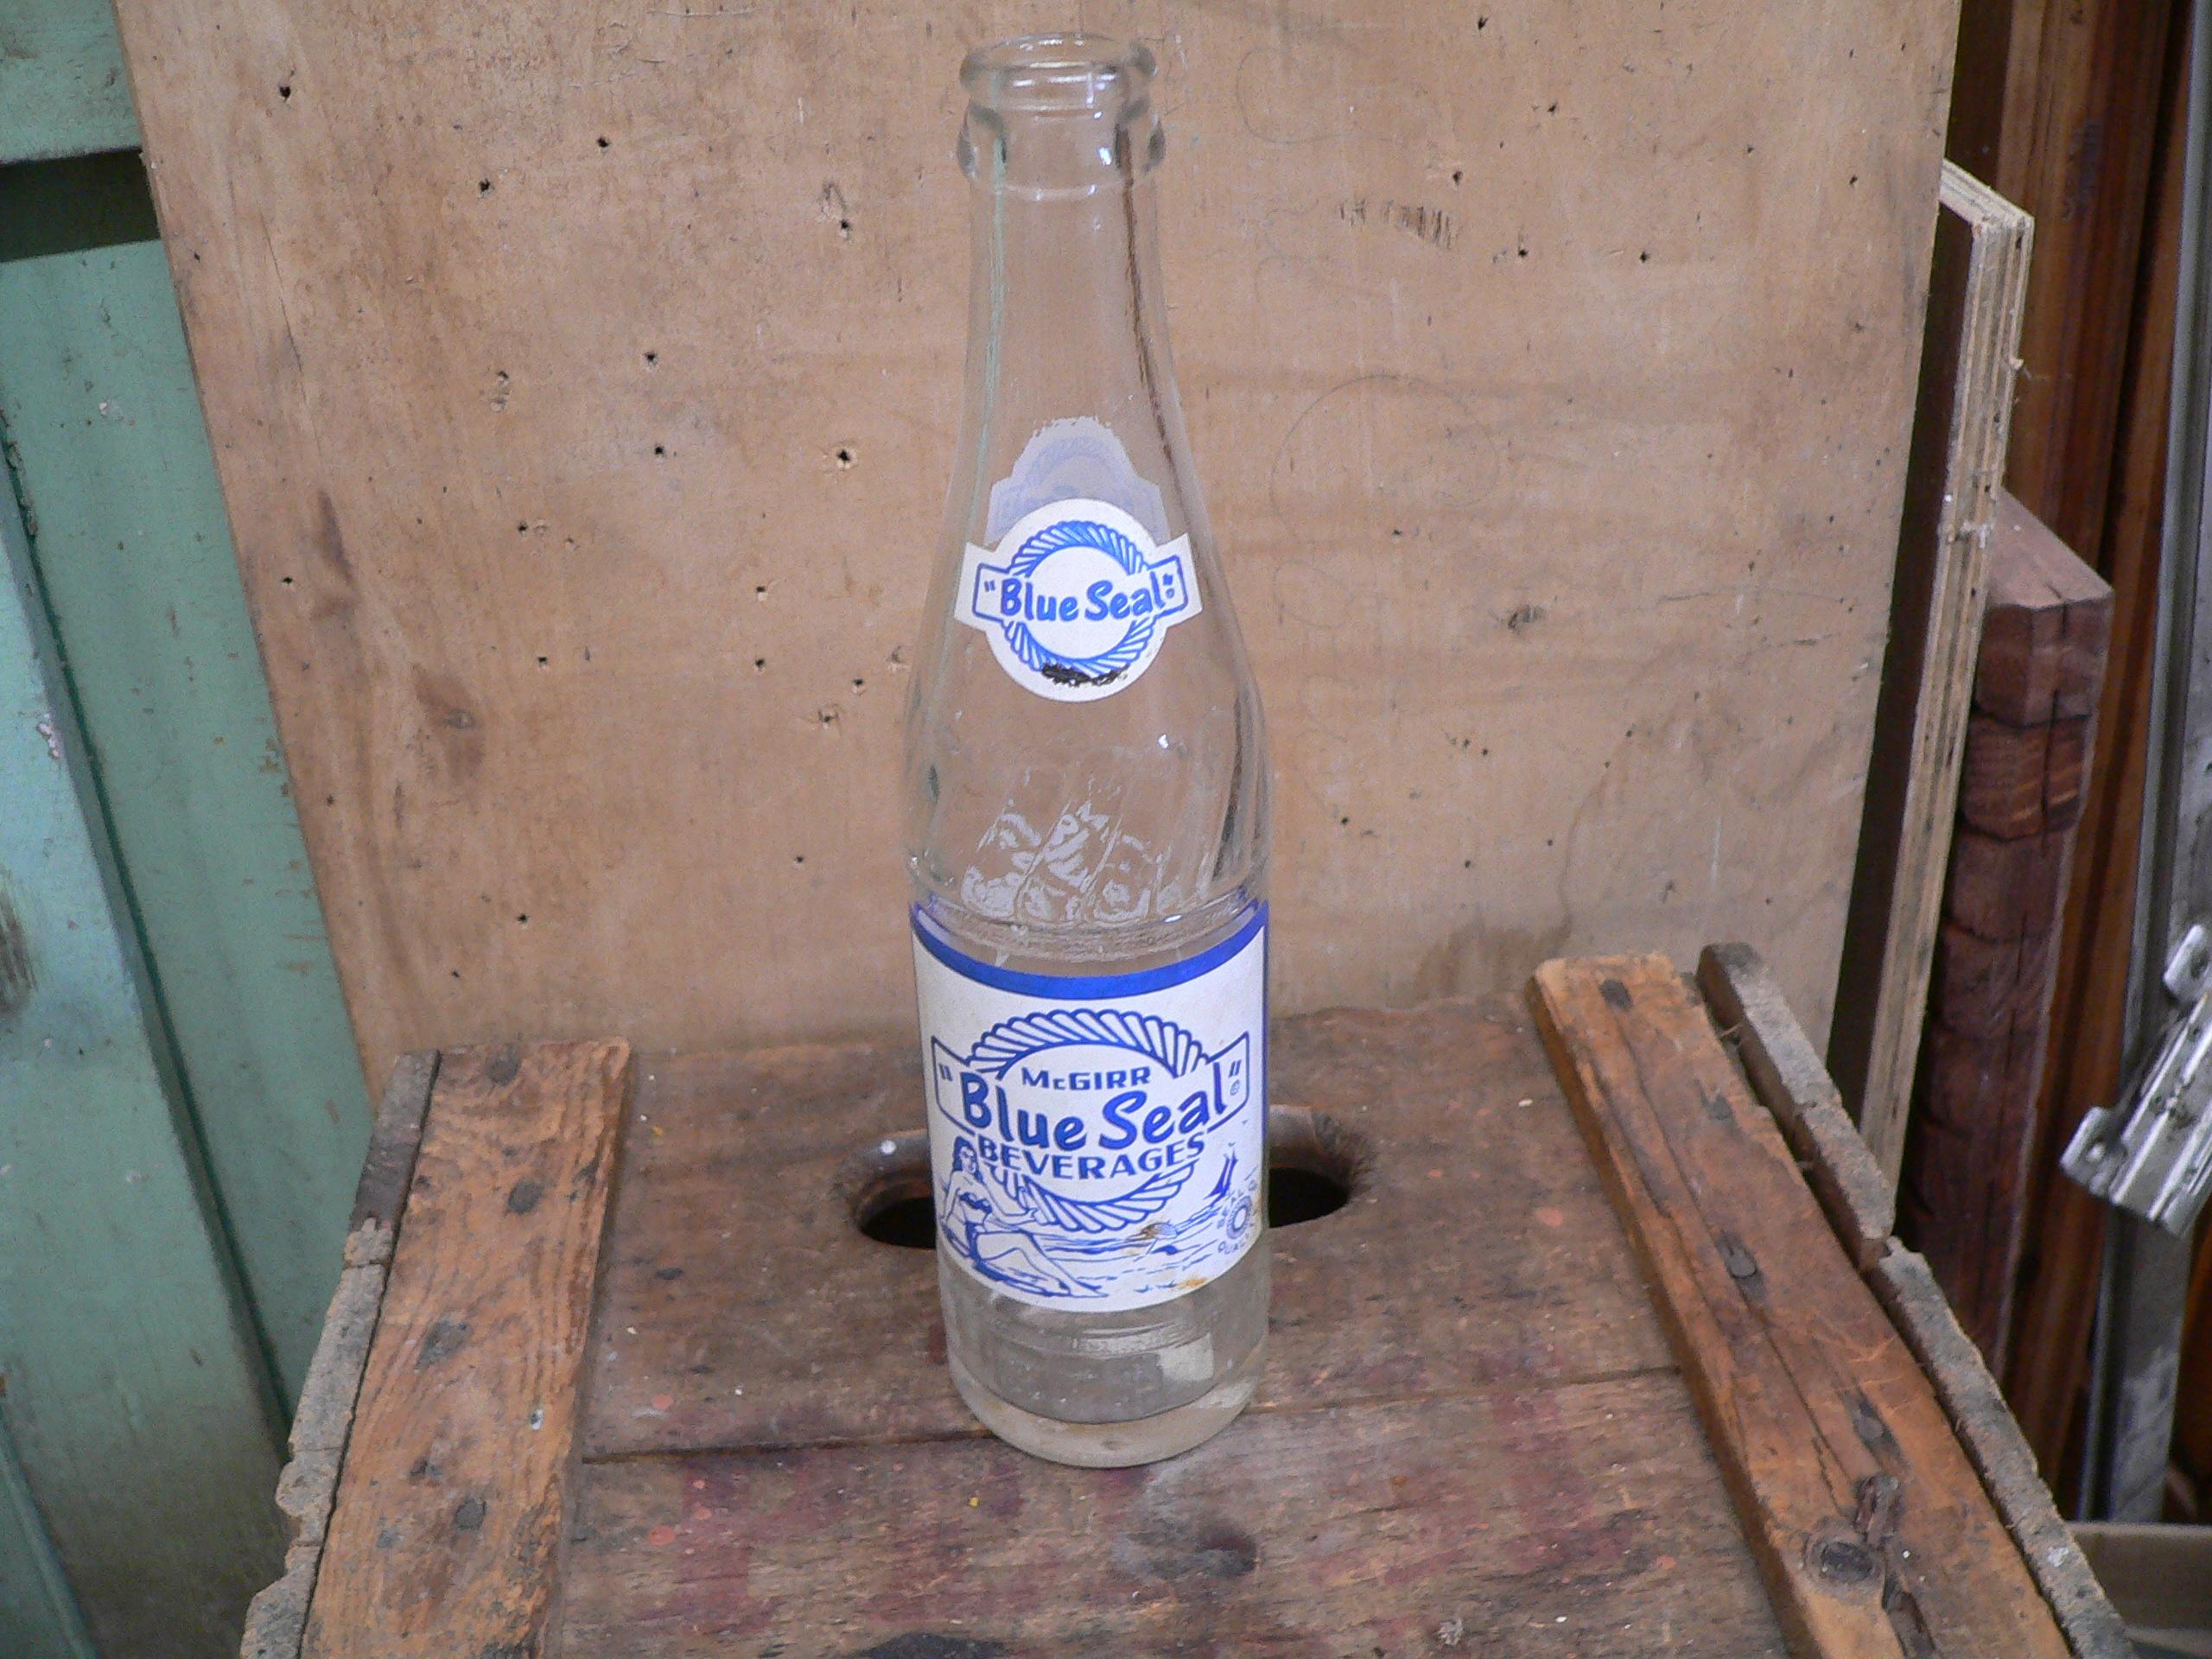 Bouteille blue seal beverages # 5717.2